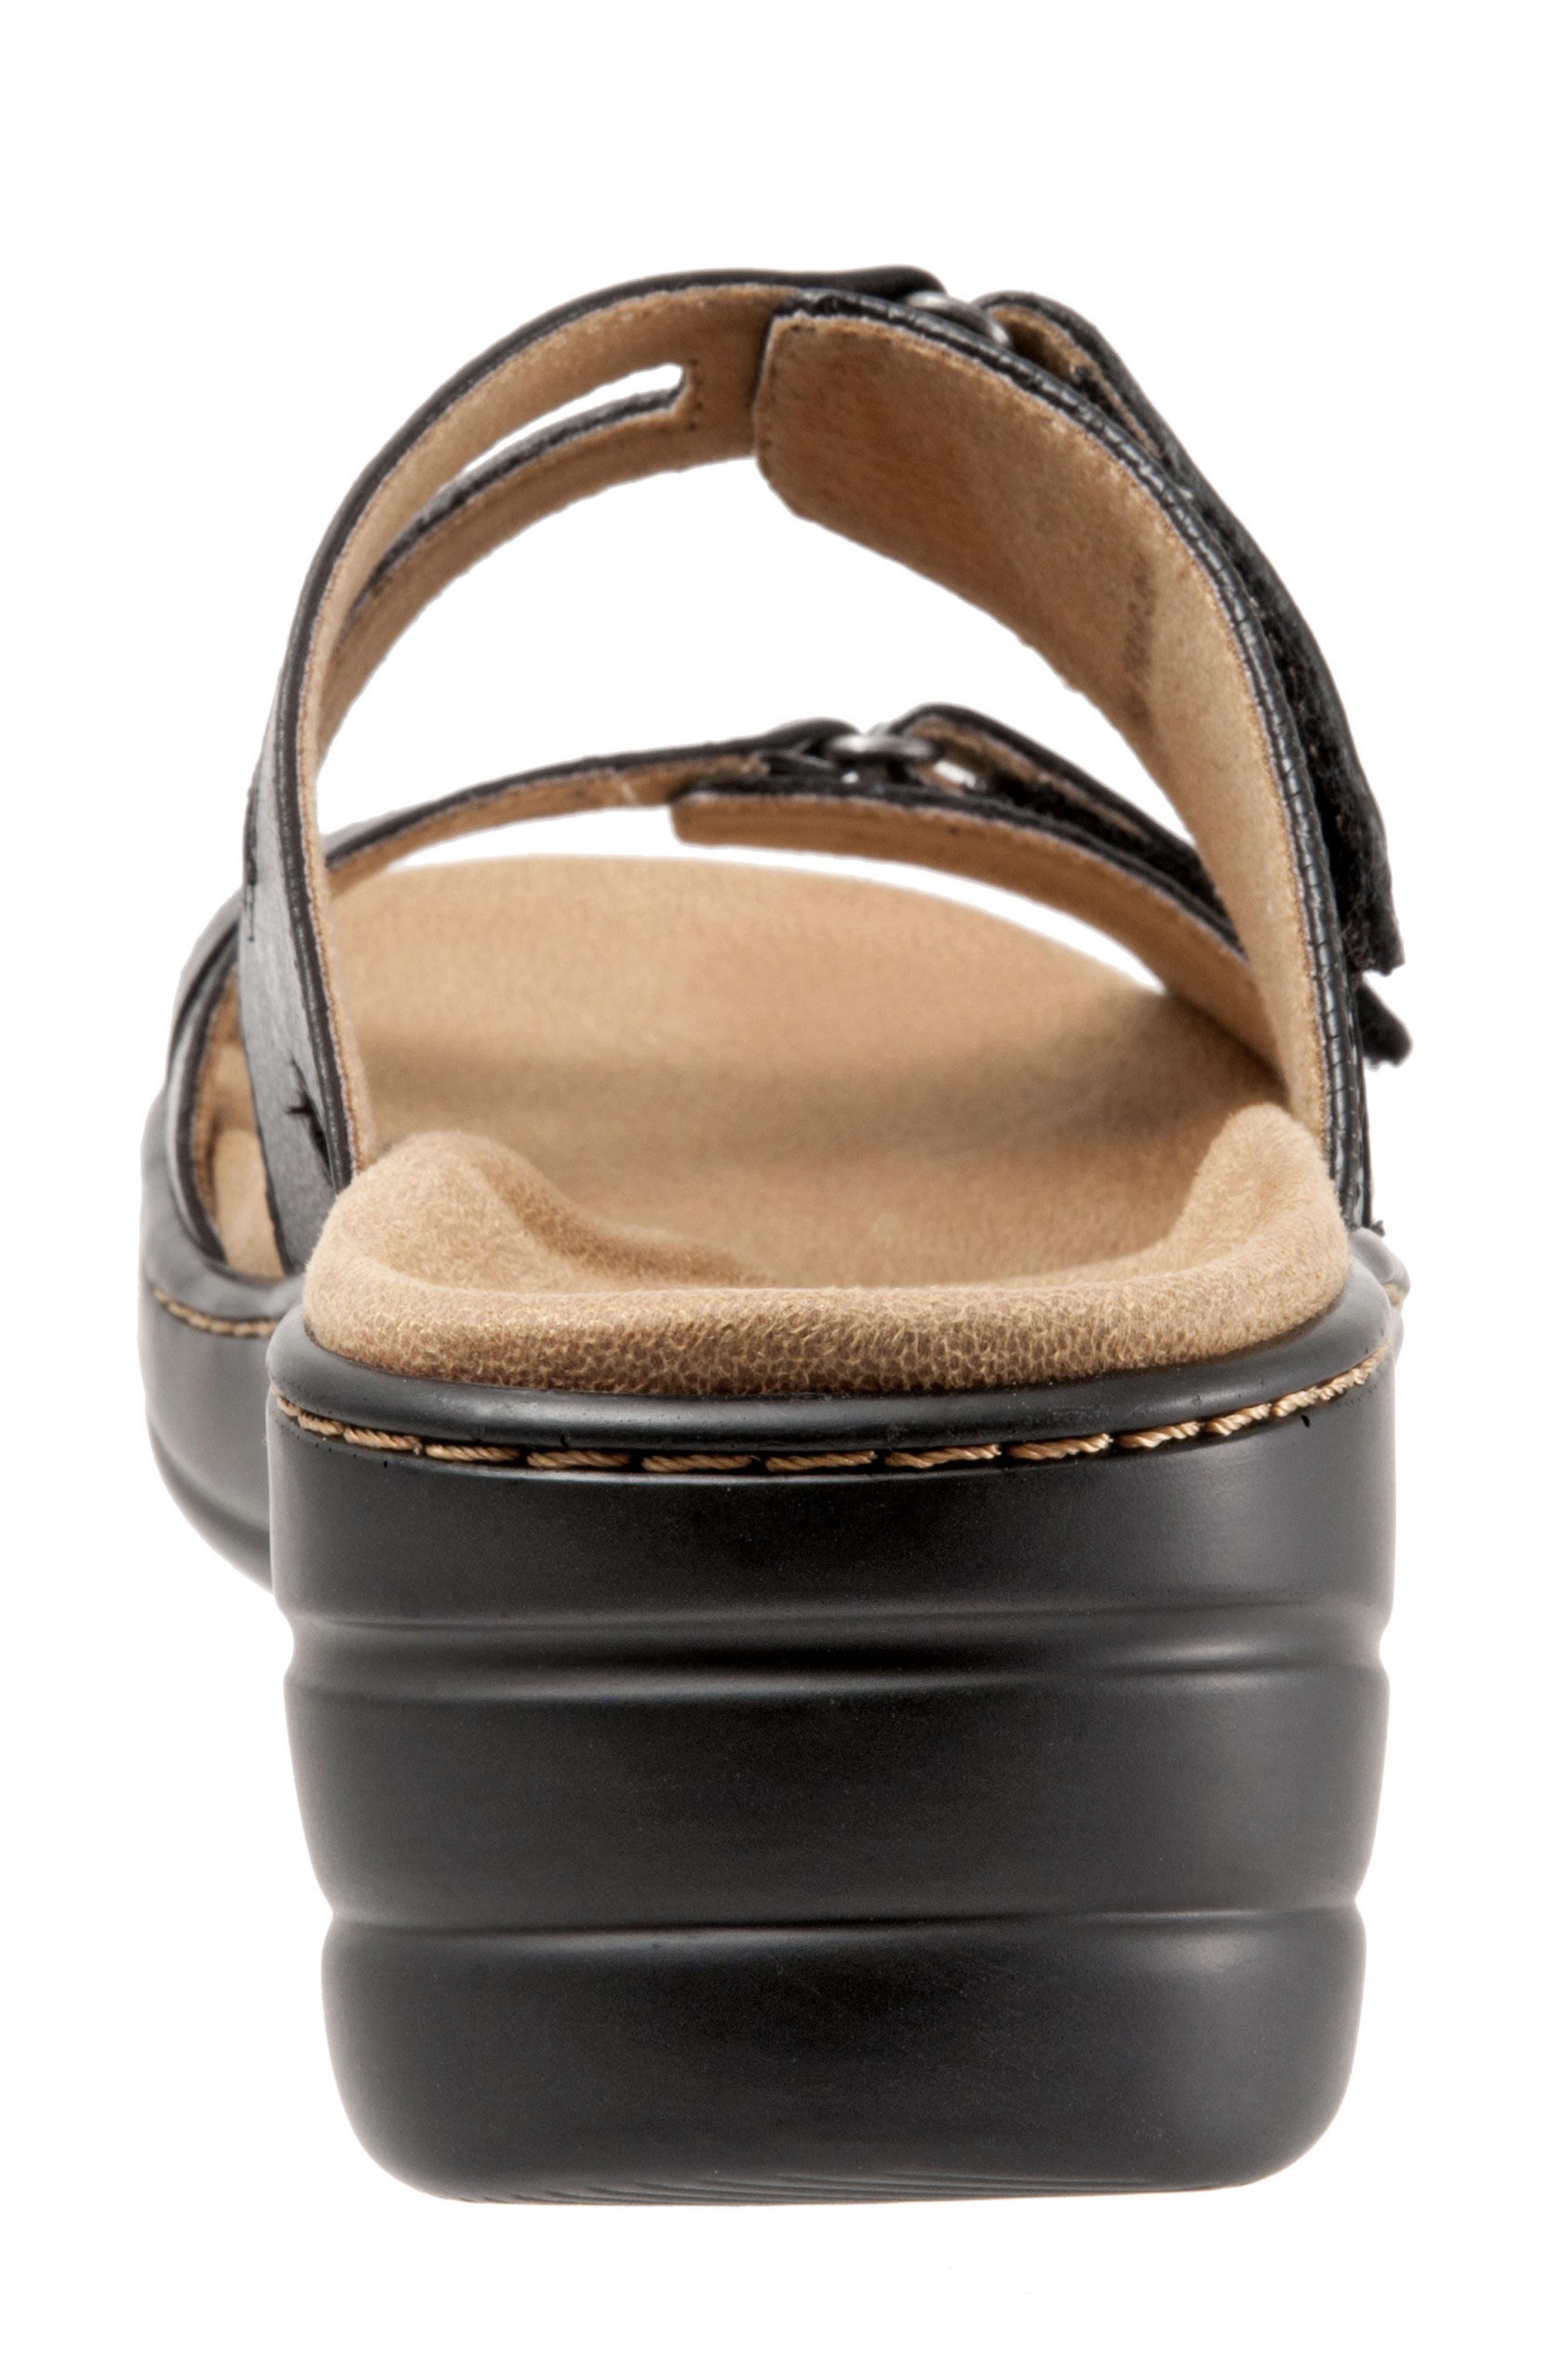 Neiman Sandal,                             Alternate thumbnail 6, color,                             Black Leather